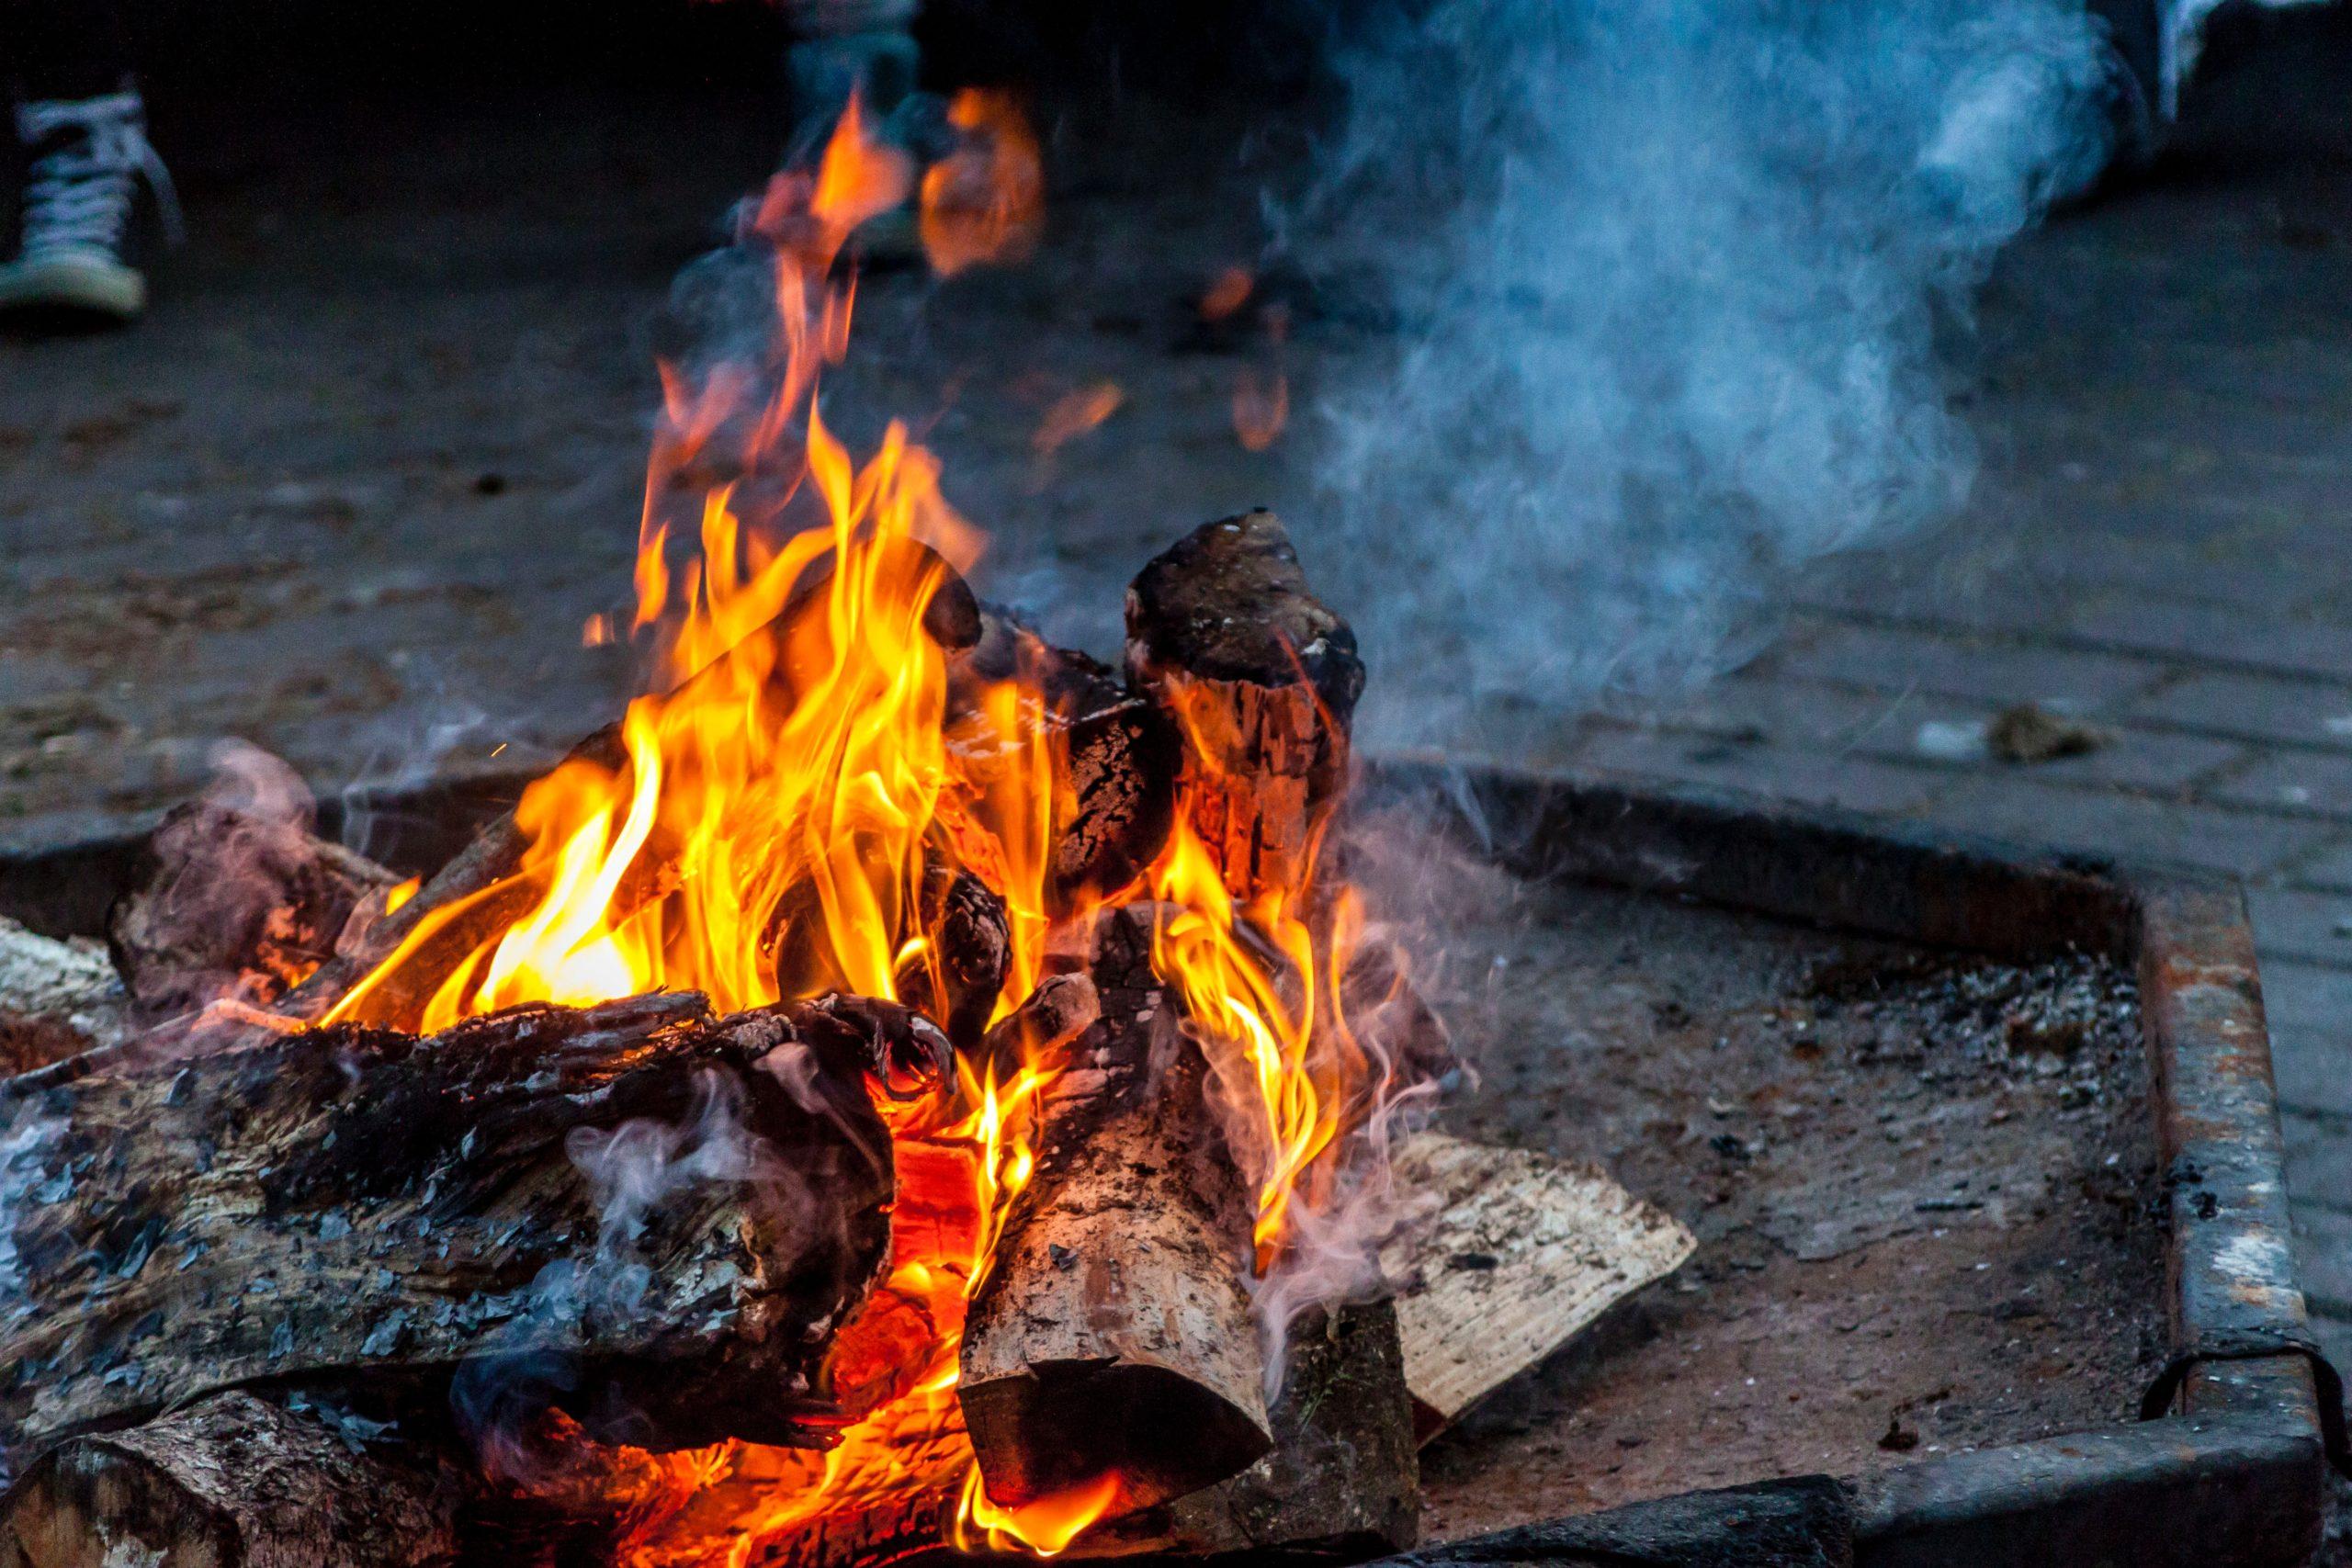 How to Build a Safe & Enjoyable Campfire